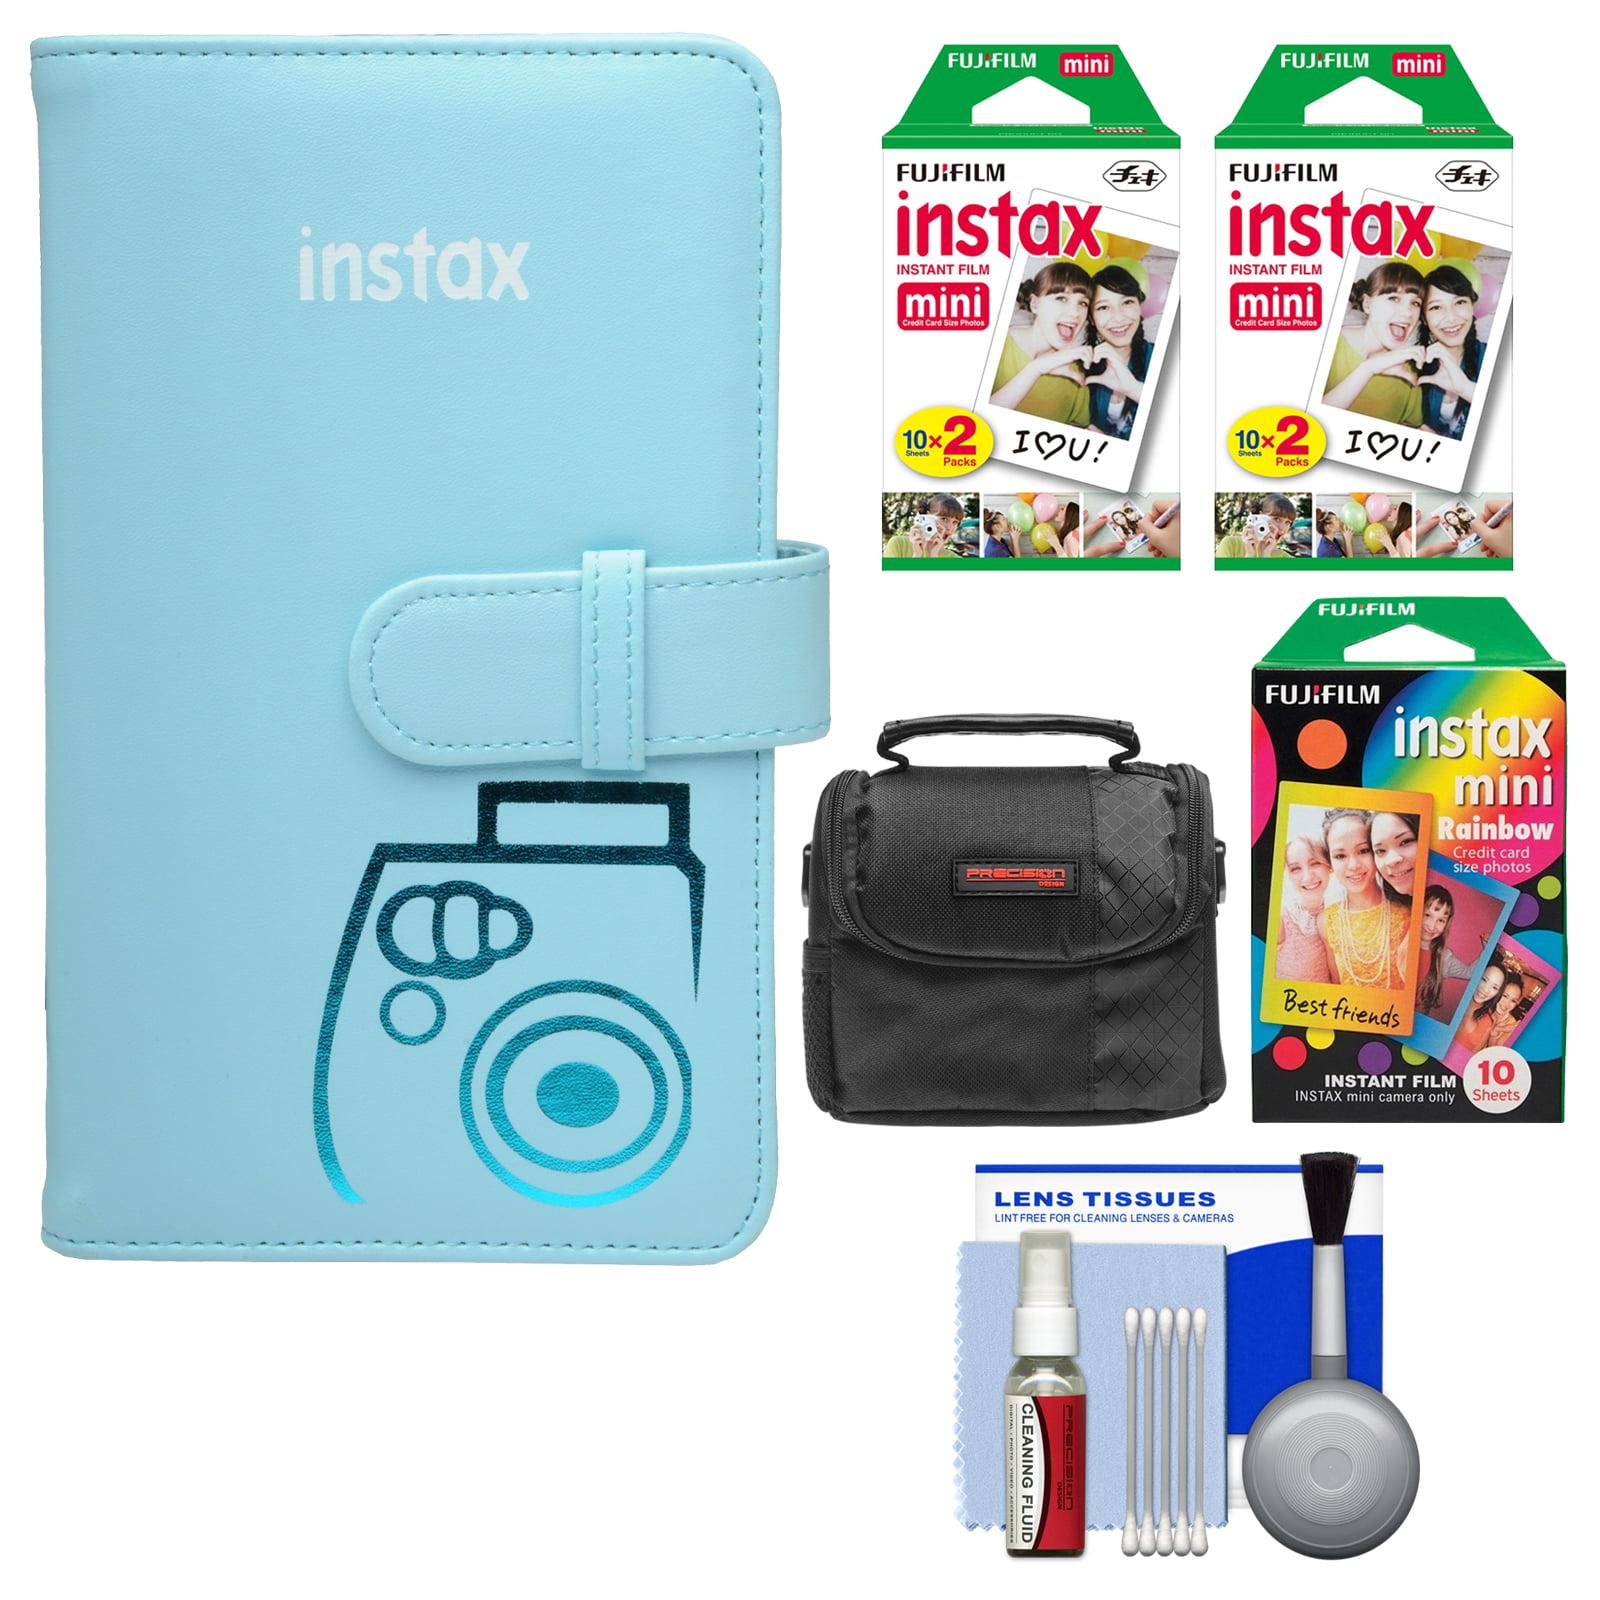 FujiFilm Instax Mini Wallet 108 Photo Album (Blue) with 40 Color Prints & 10 Rainbow Prints + Case + Kit for... by Fujifilm